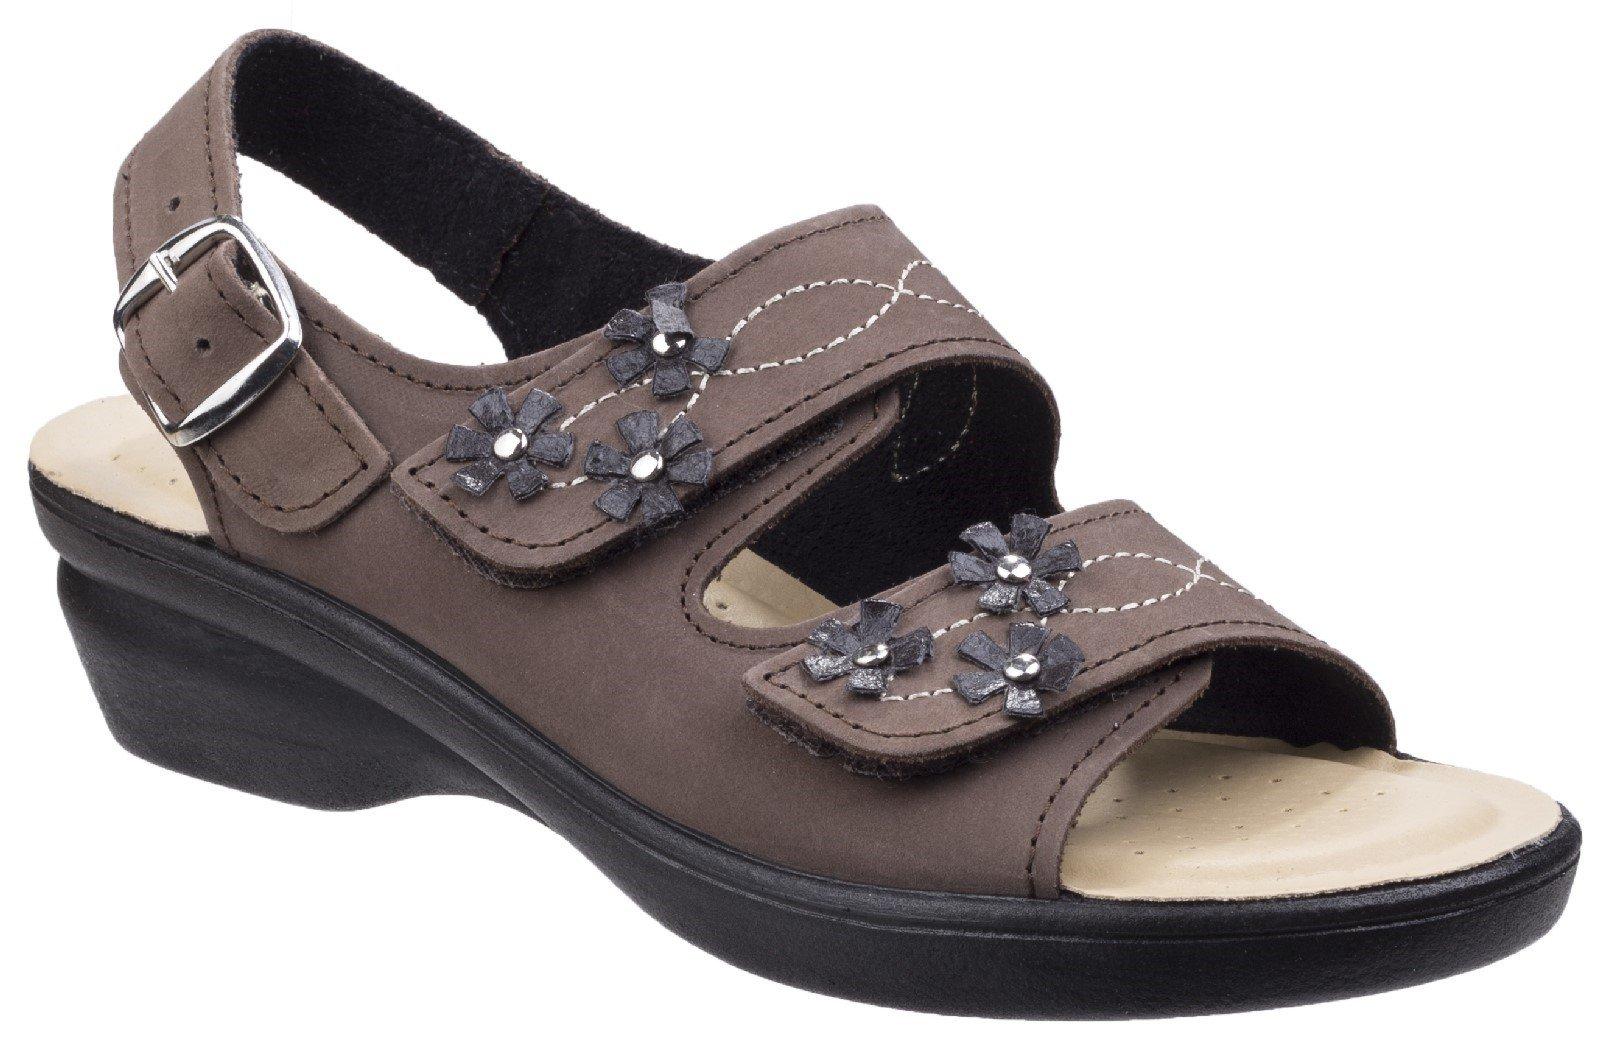 Fleet & Foster Women's Amaretto Touch Fastening Sandal Various Colours 26298 - Brown 8